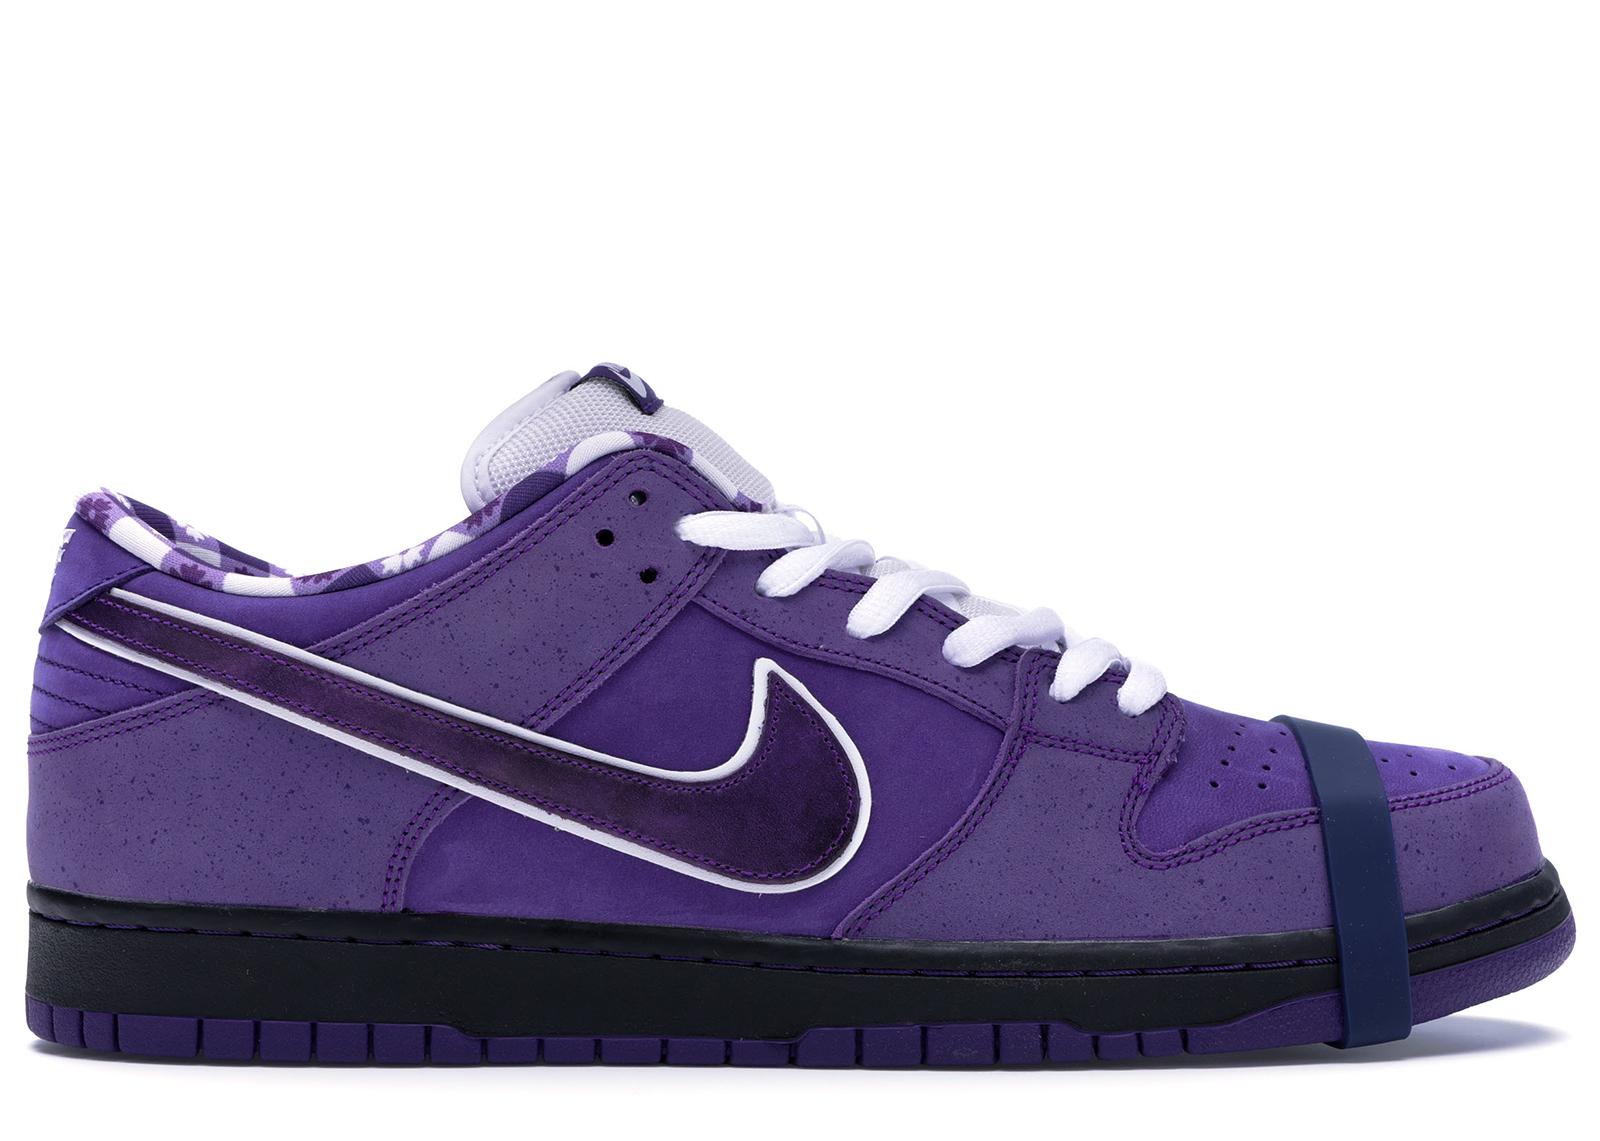 Lobster Sb Dunk Nike Concepts Low Purple Im7gYf6vby